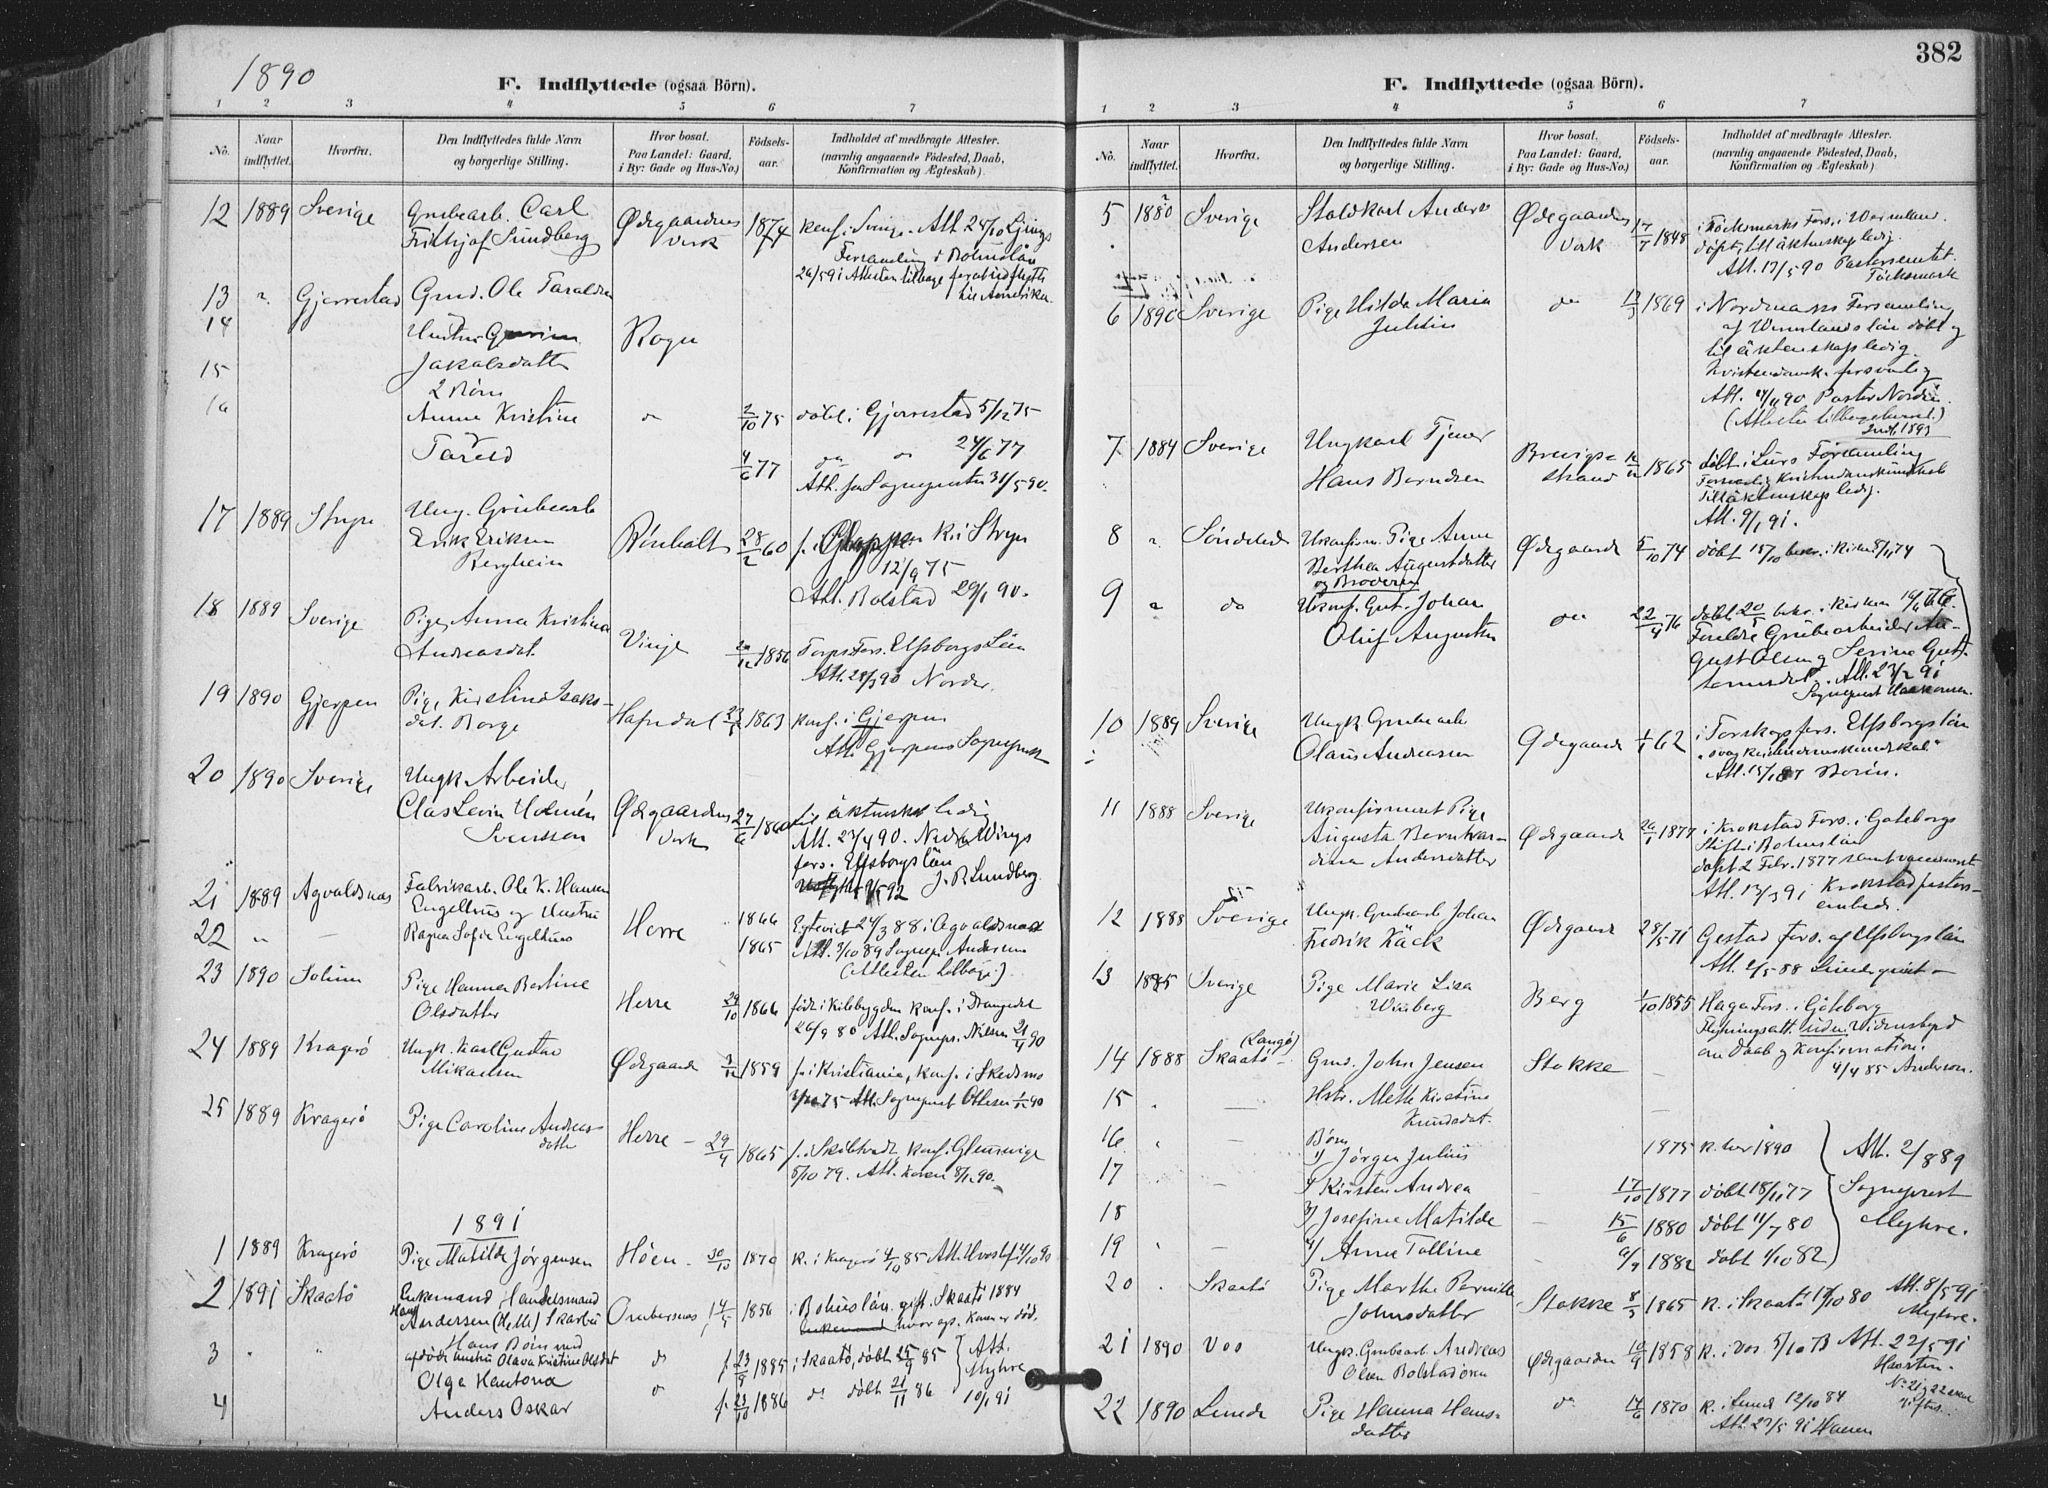 SAKO, Bamble kirkebøker, F/Fa/L0008: Ministerialbok nr. I 8, 1888-1900, s. 382